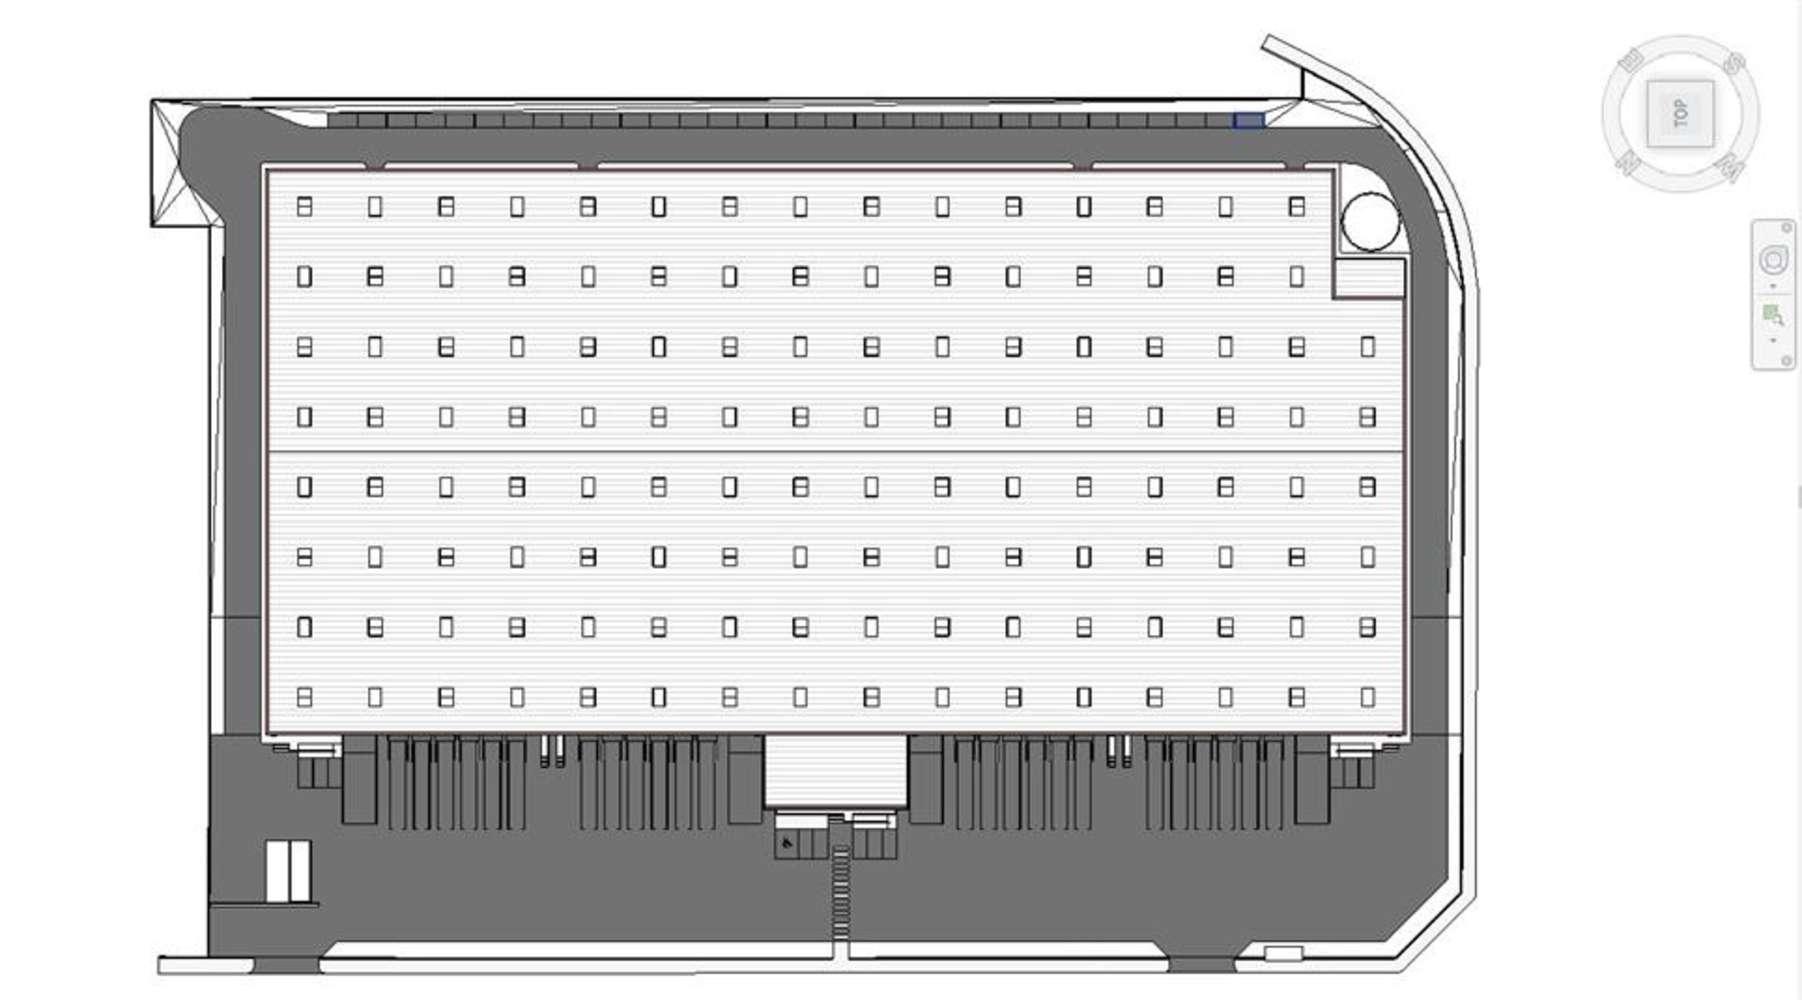 Naves industriales y logísticas Martorelles, 08107 - Nave Logística - B0415 - PI Segro Logistics Park II - 11438